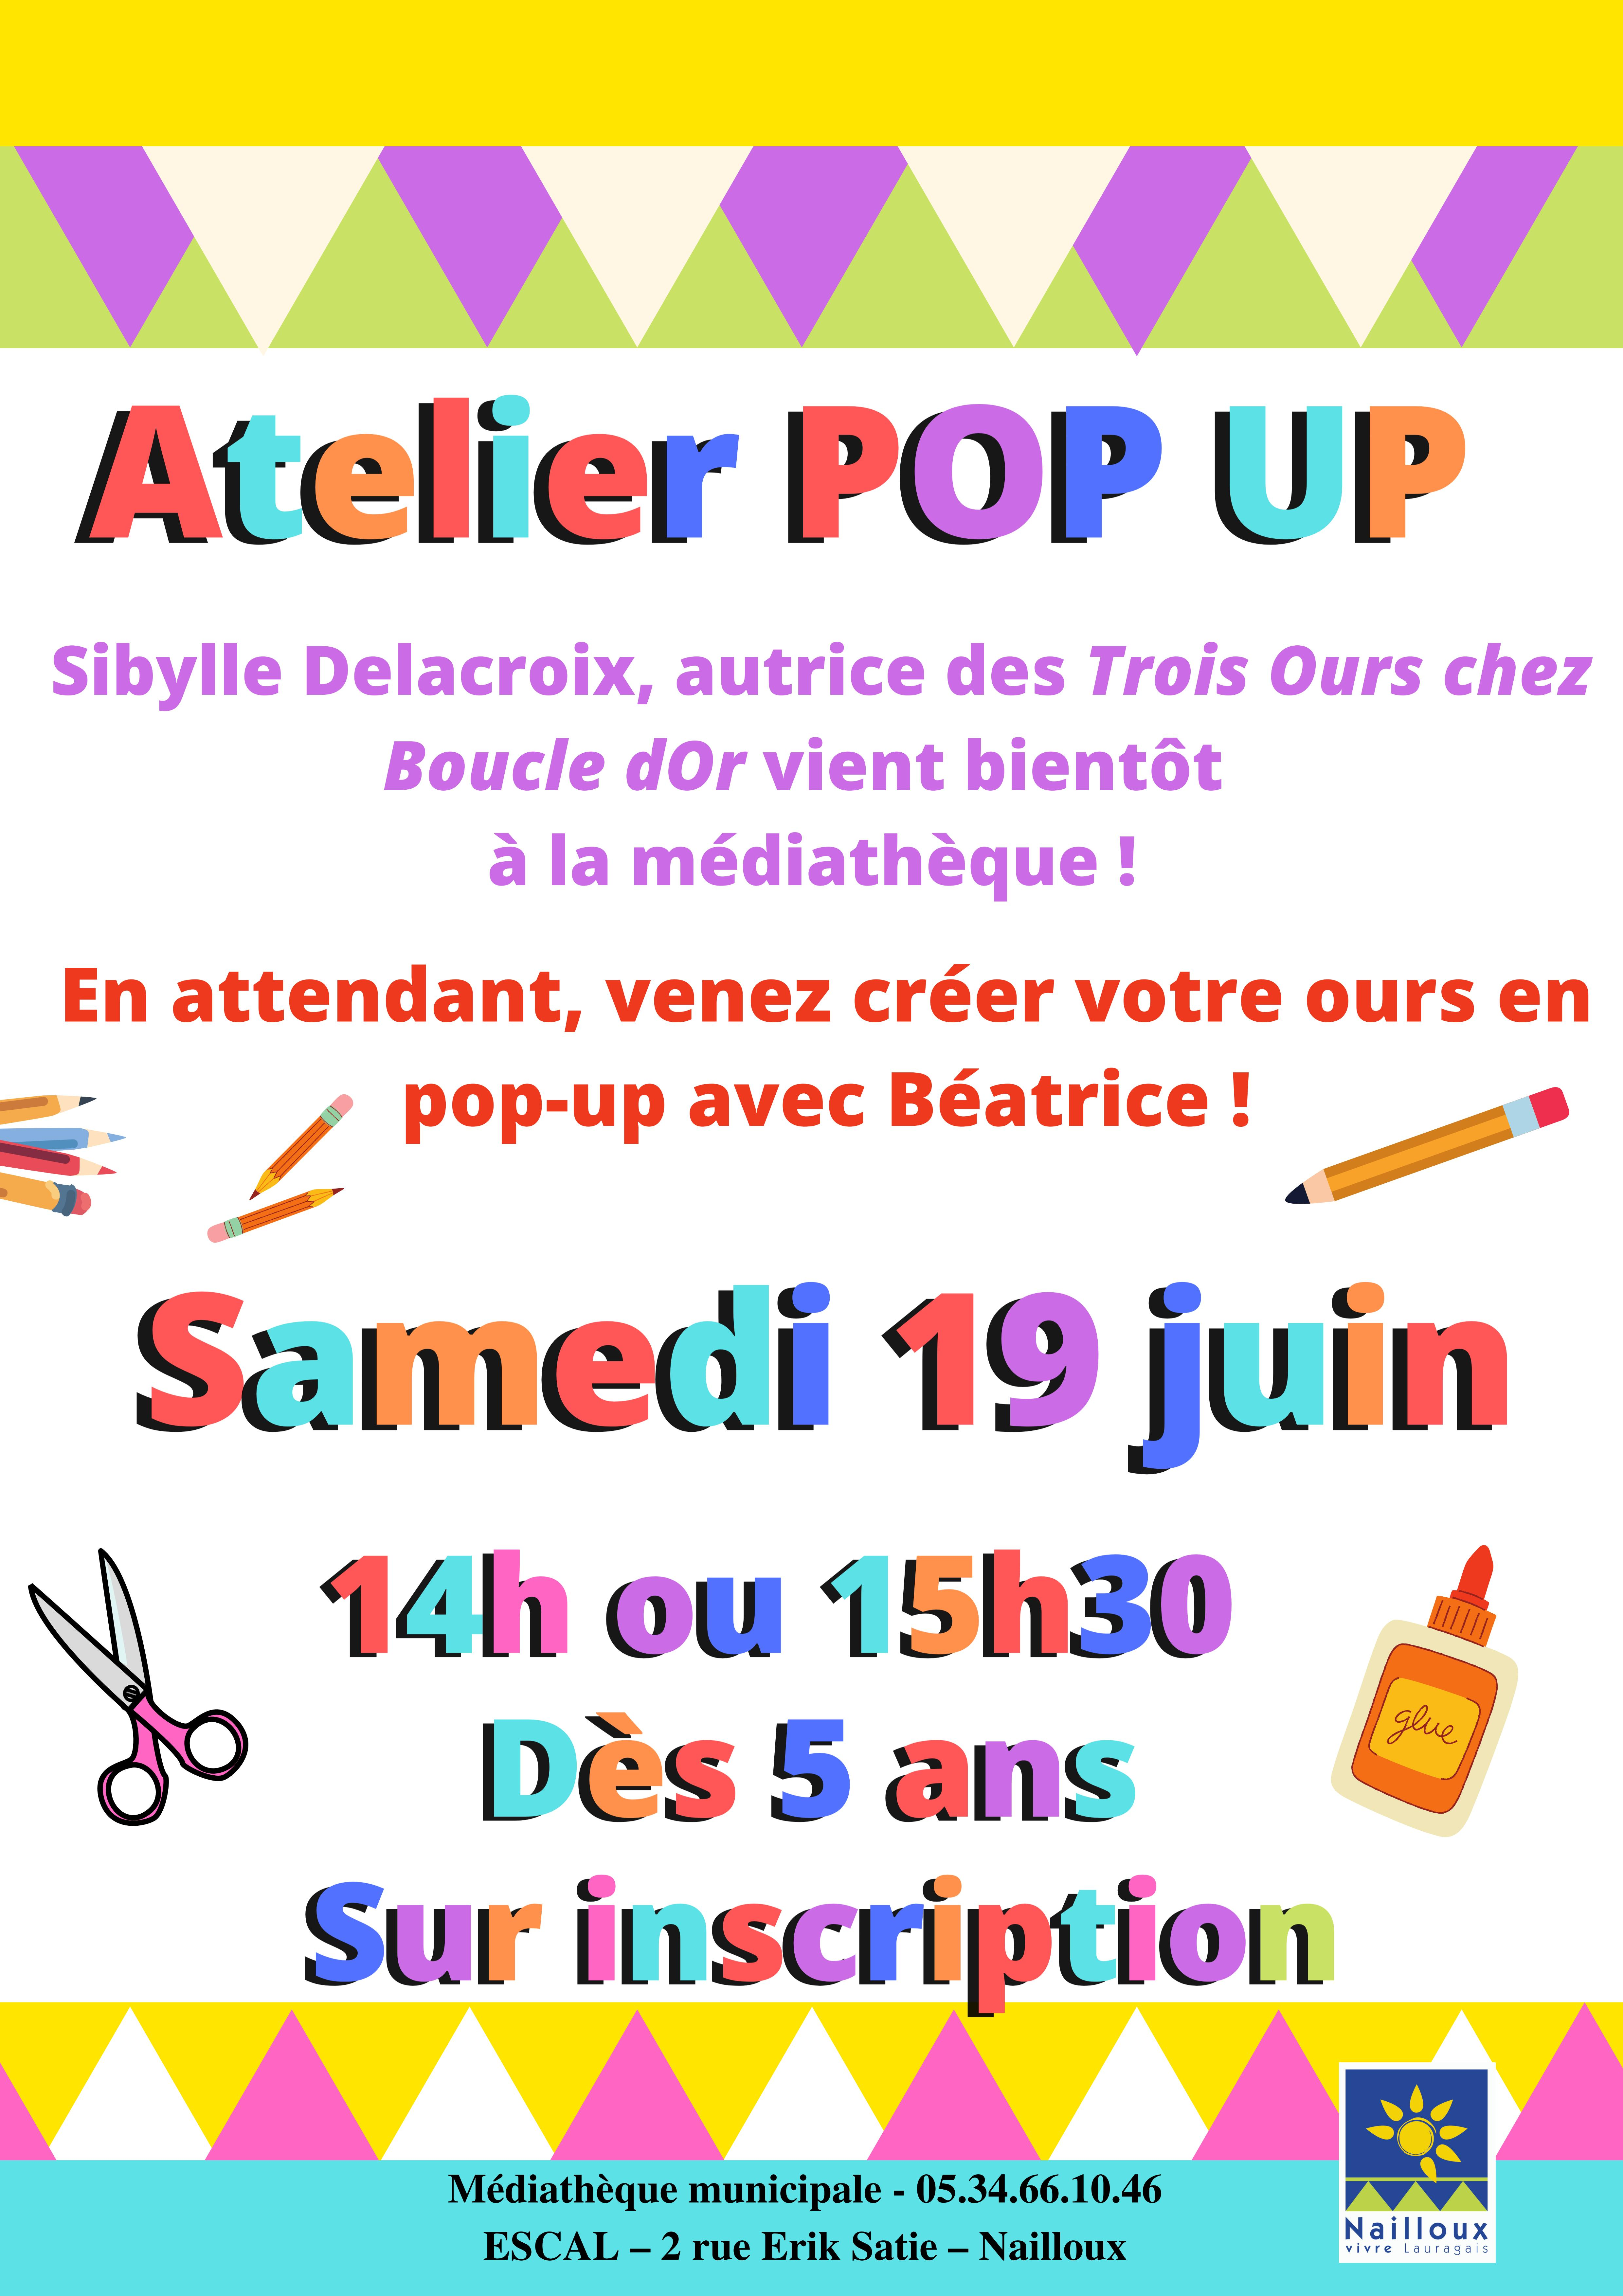 Atelier Pop Up